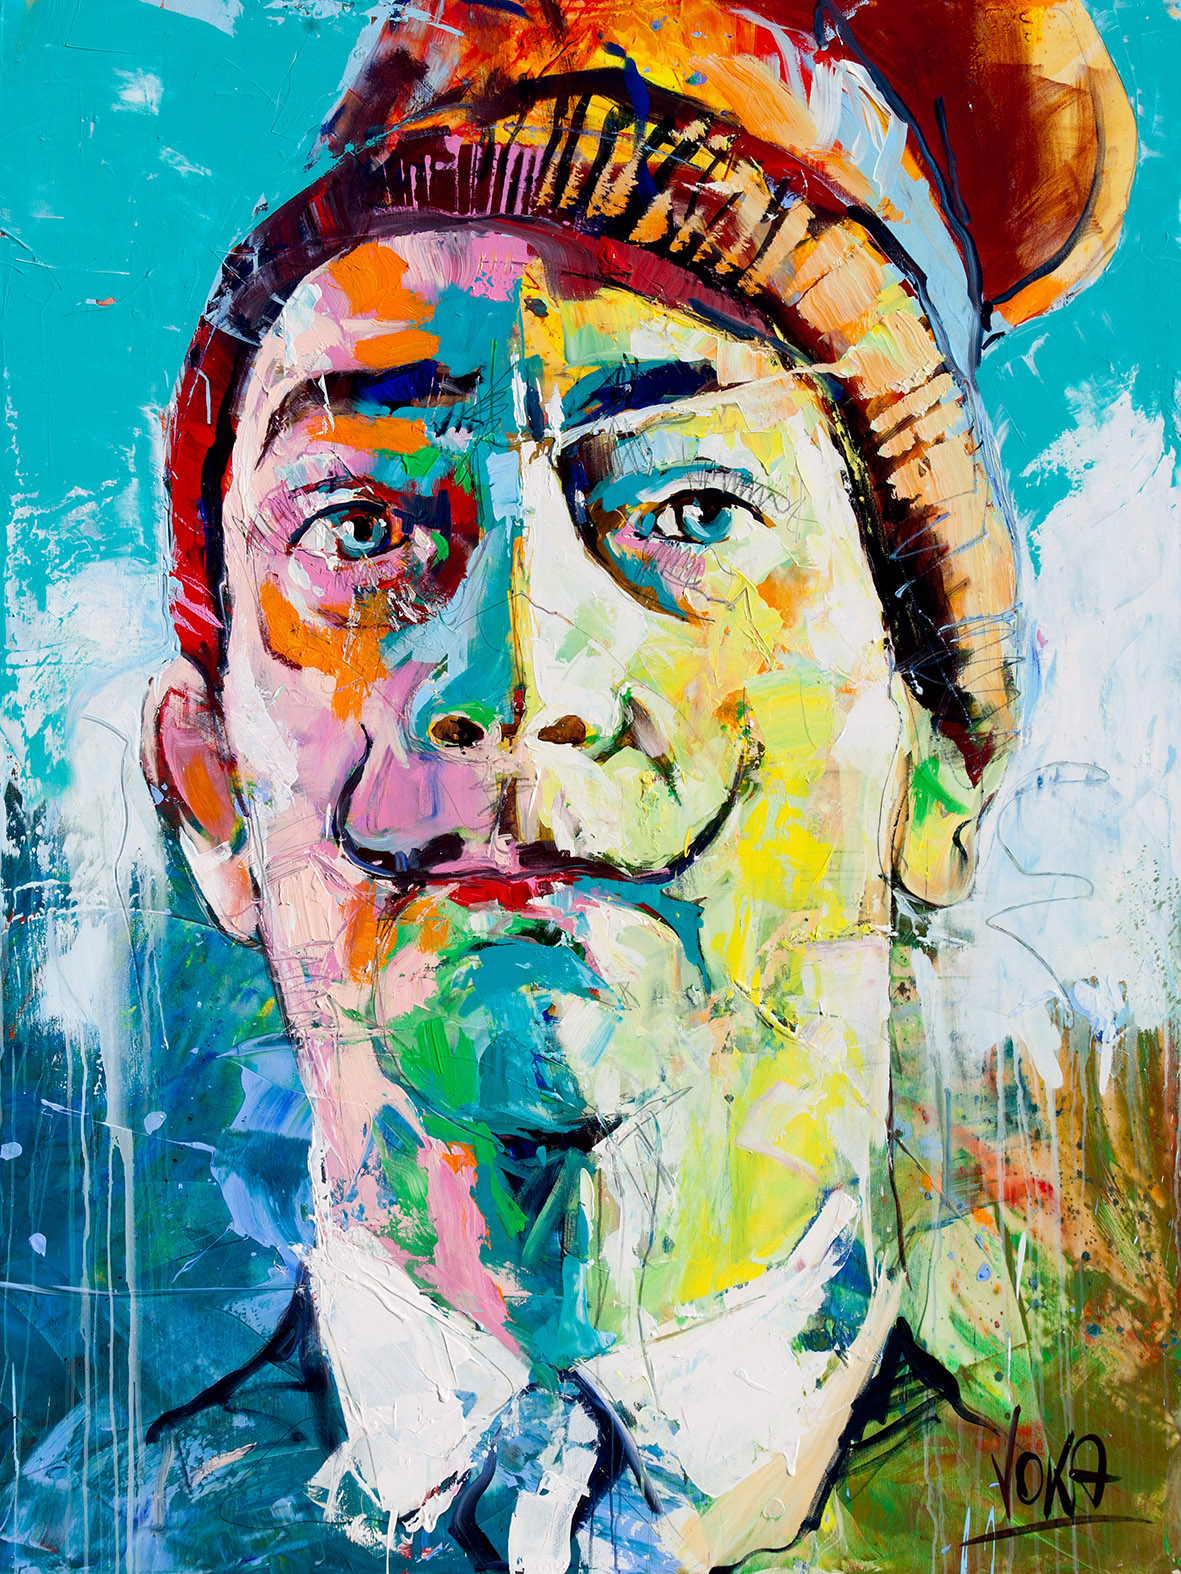 Salvador, 200x150 cm/78,7x59,0 inch, Acrylic on Canvas